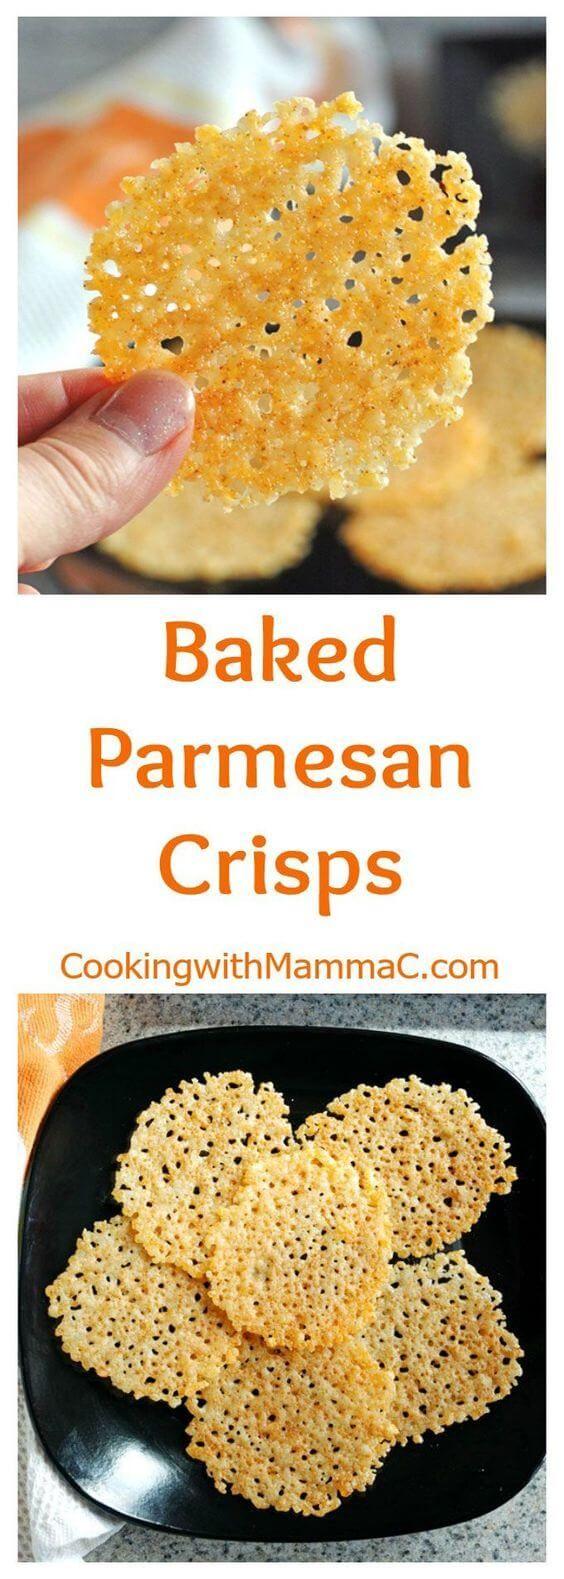 Quick & Easy Baked Parmesan Crisps Recipe